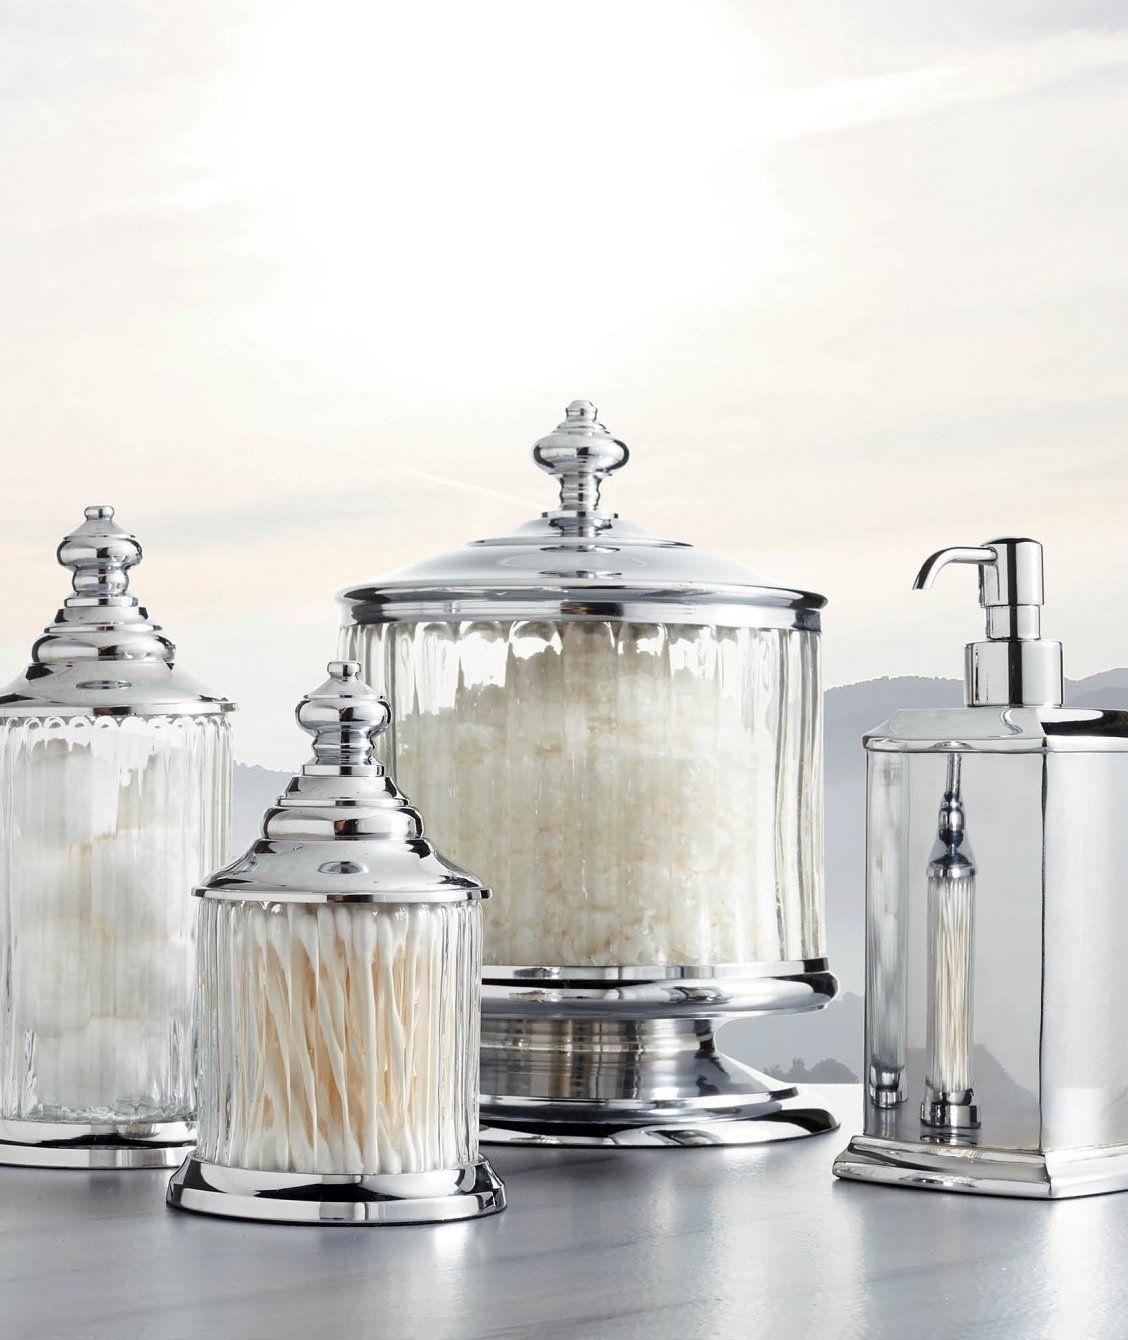 Resort Bath Accessories Luxury Home Decor Vintage Industrial